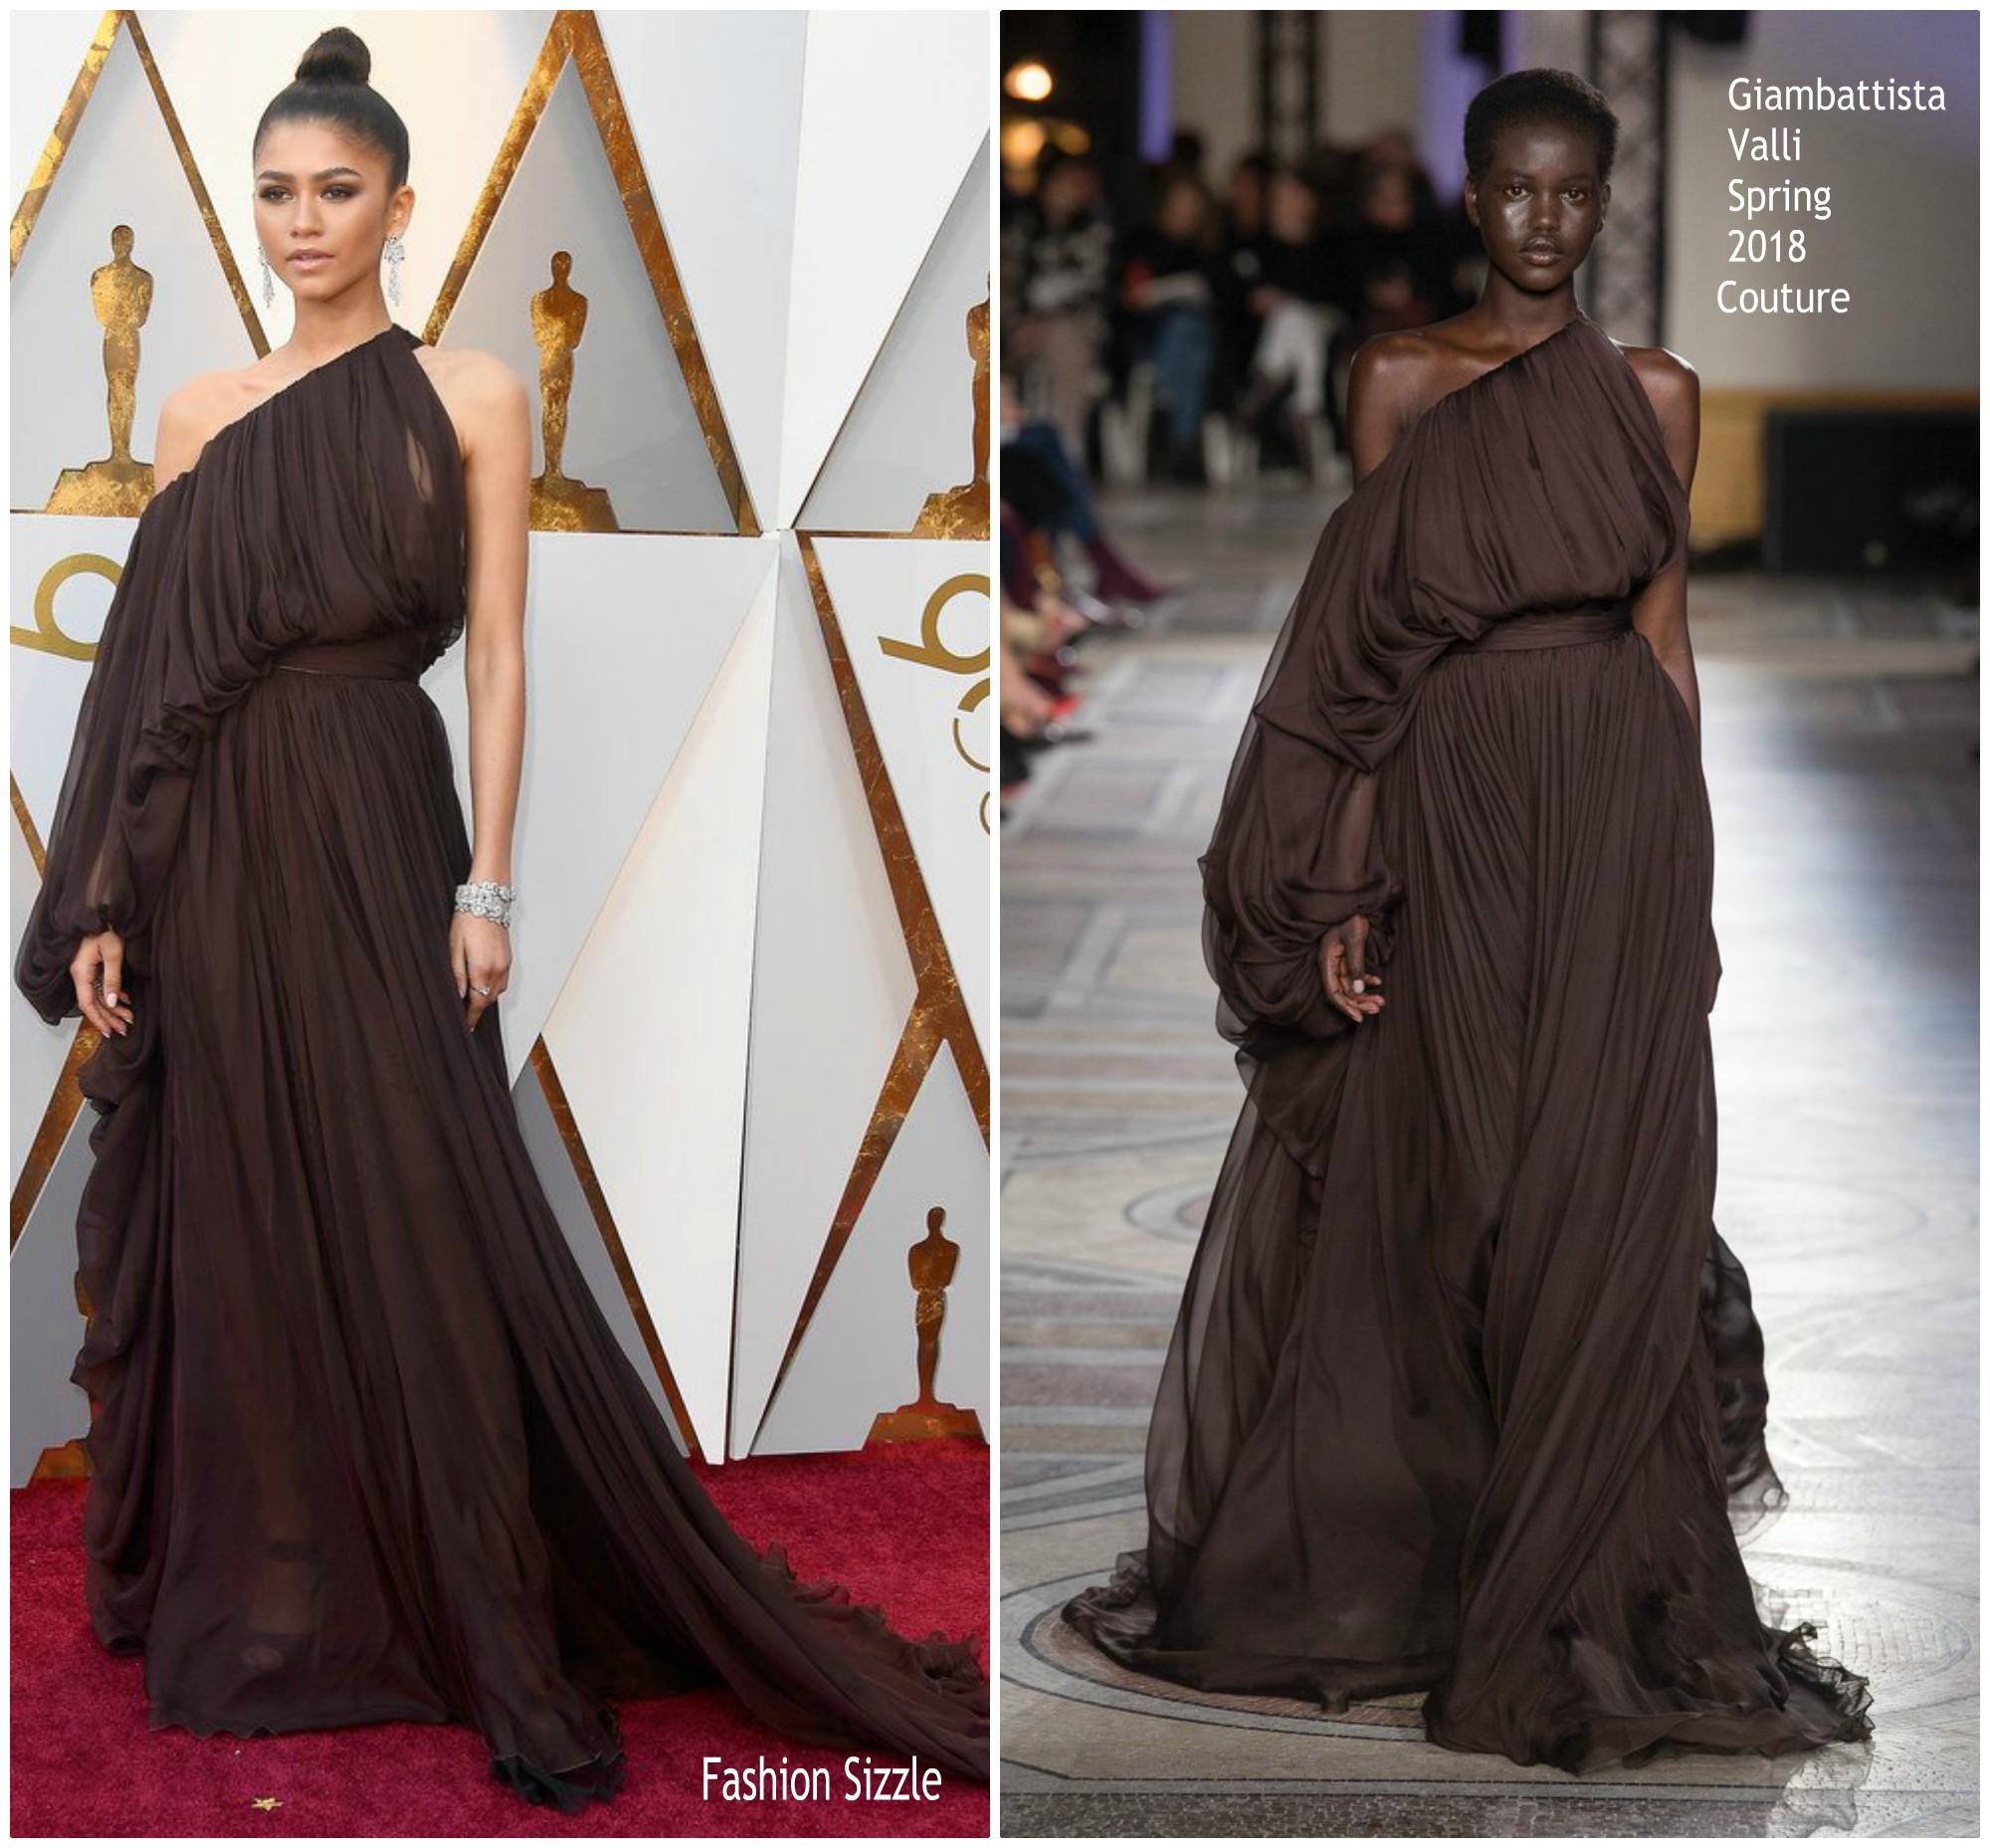 zendaya-coleman-in-giambattista-valli-couture-2018-oscars